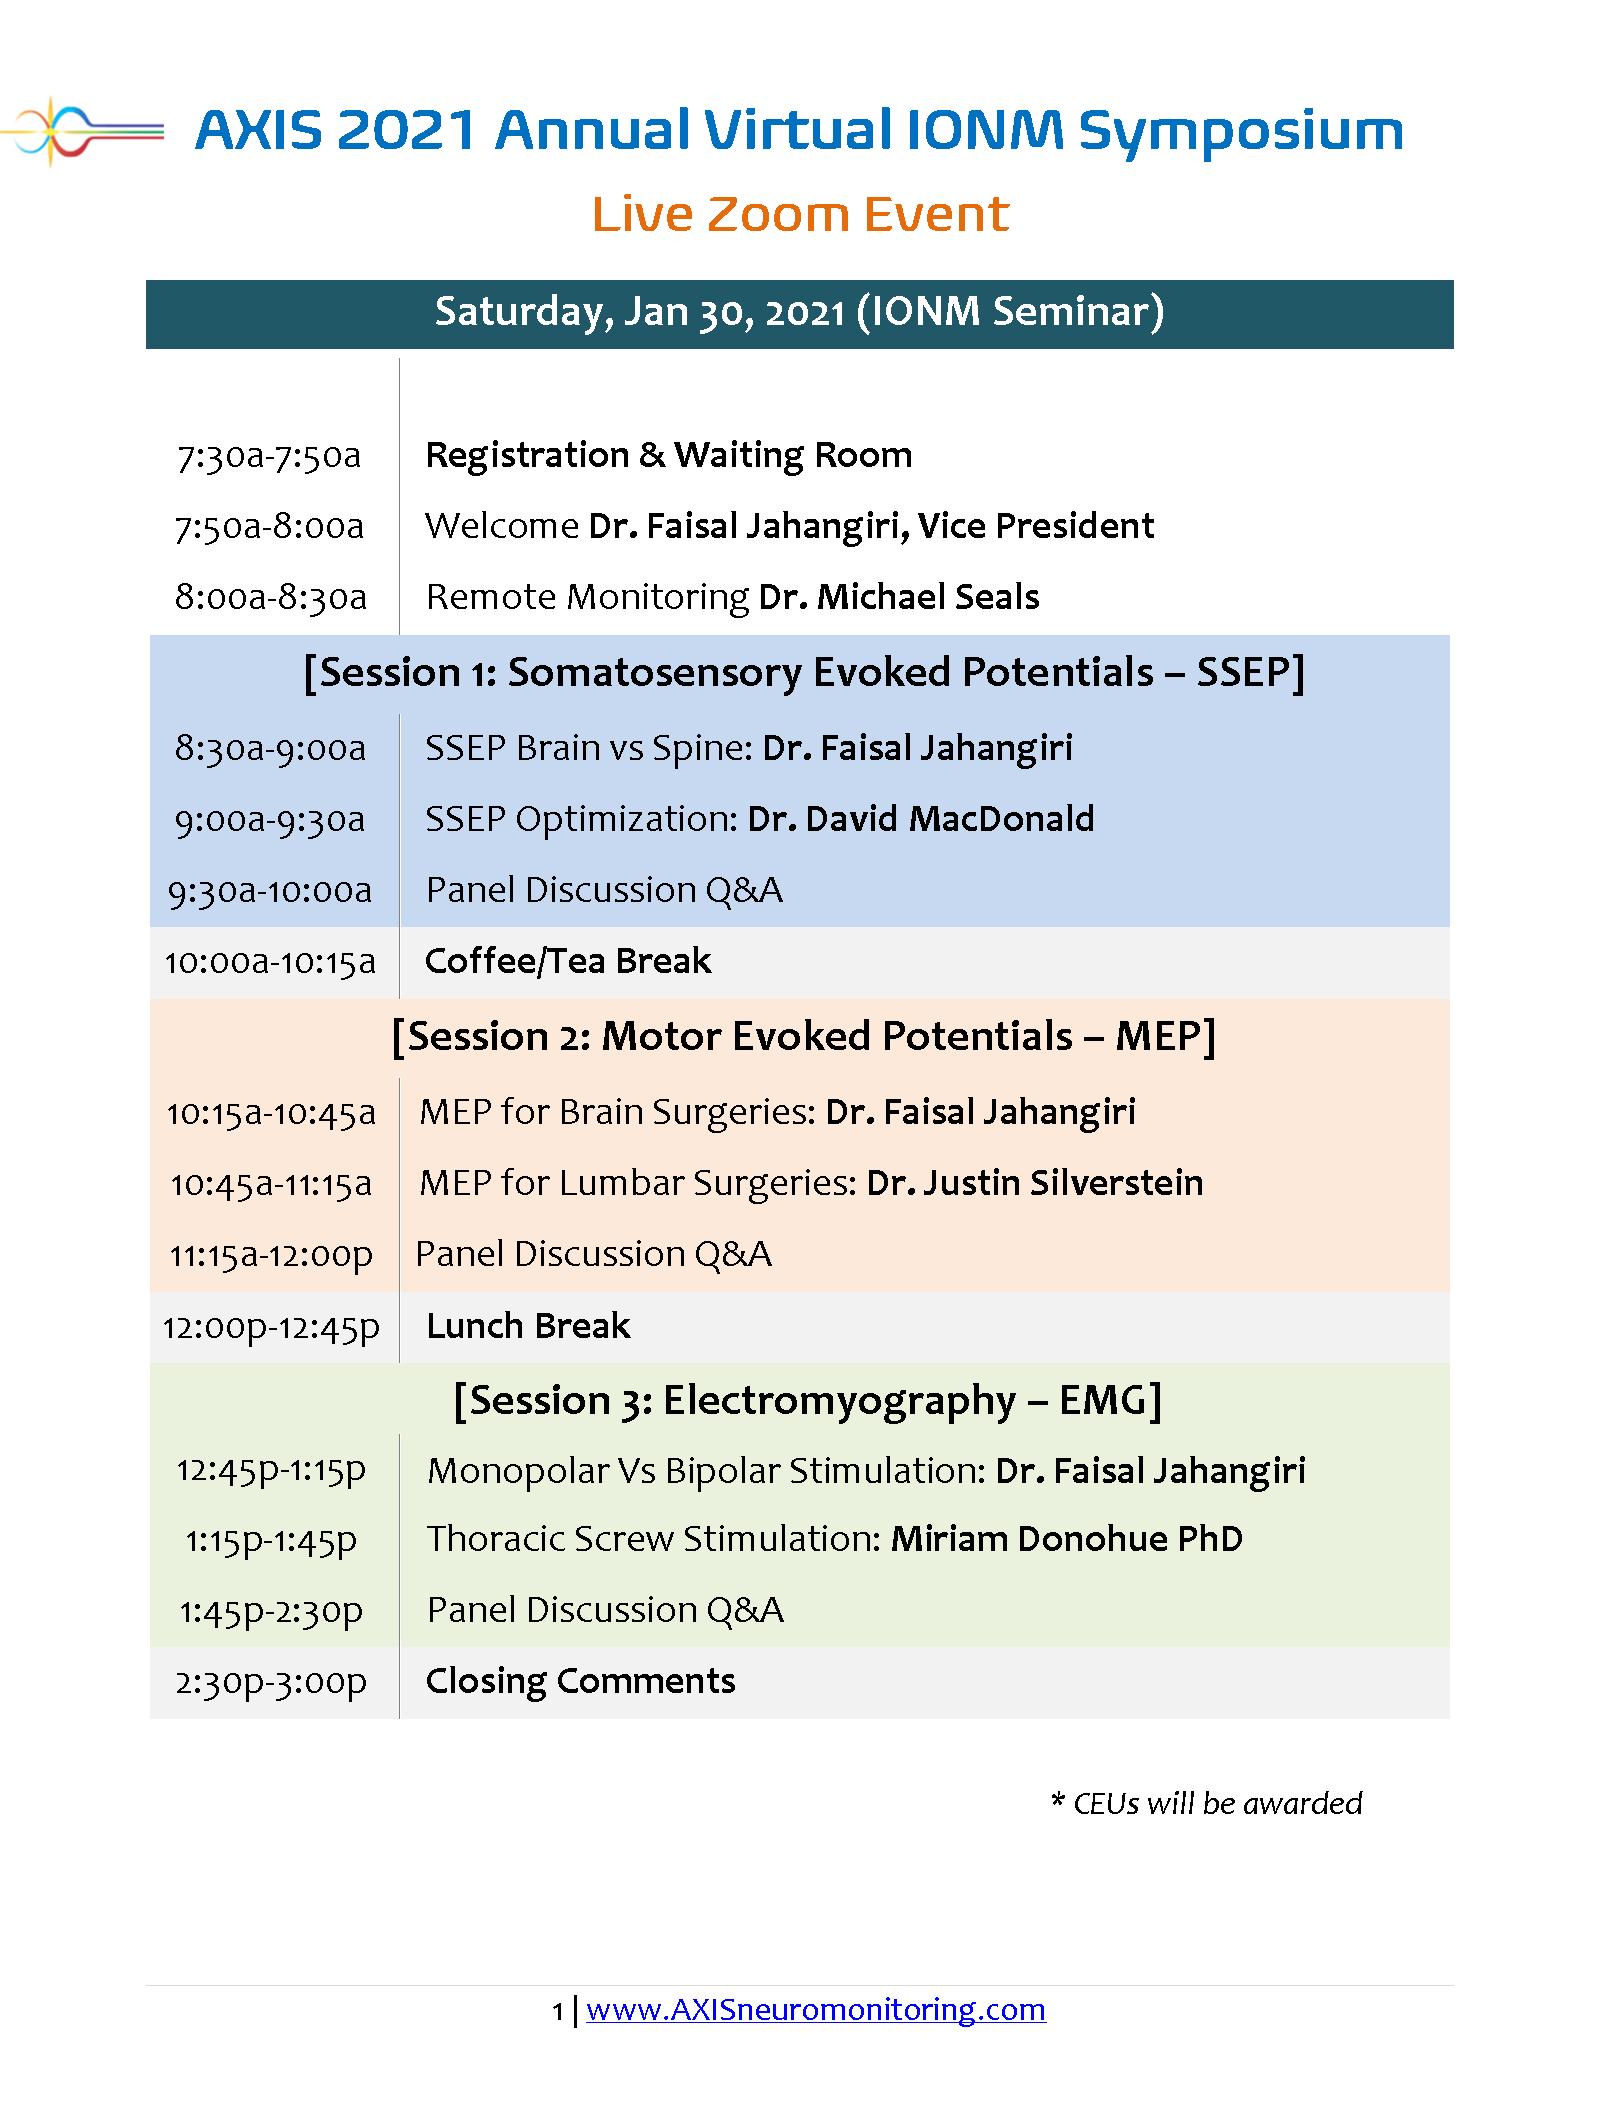 Copy of 2021 Axis Symposium Program1.png (64 KB)